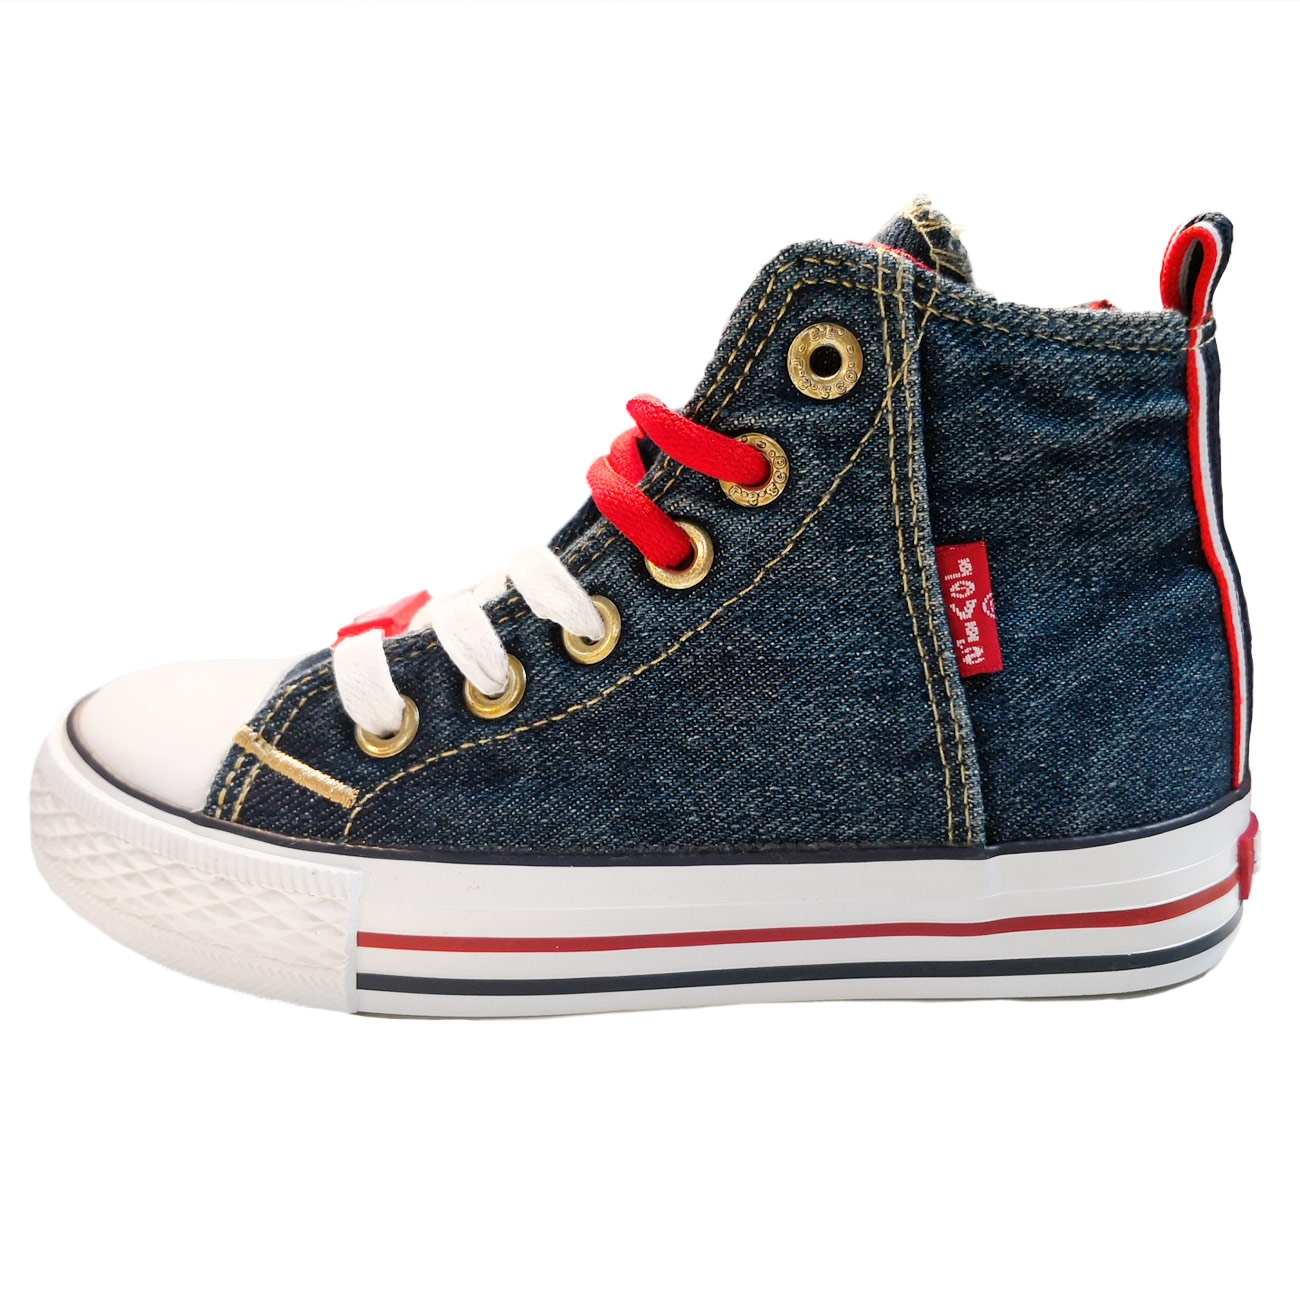 Levi's Sneakers Original Hi Blue Denim